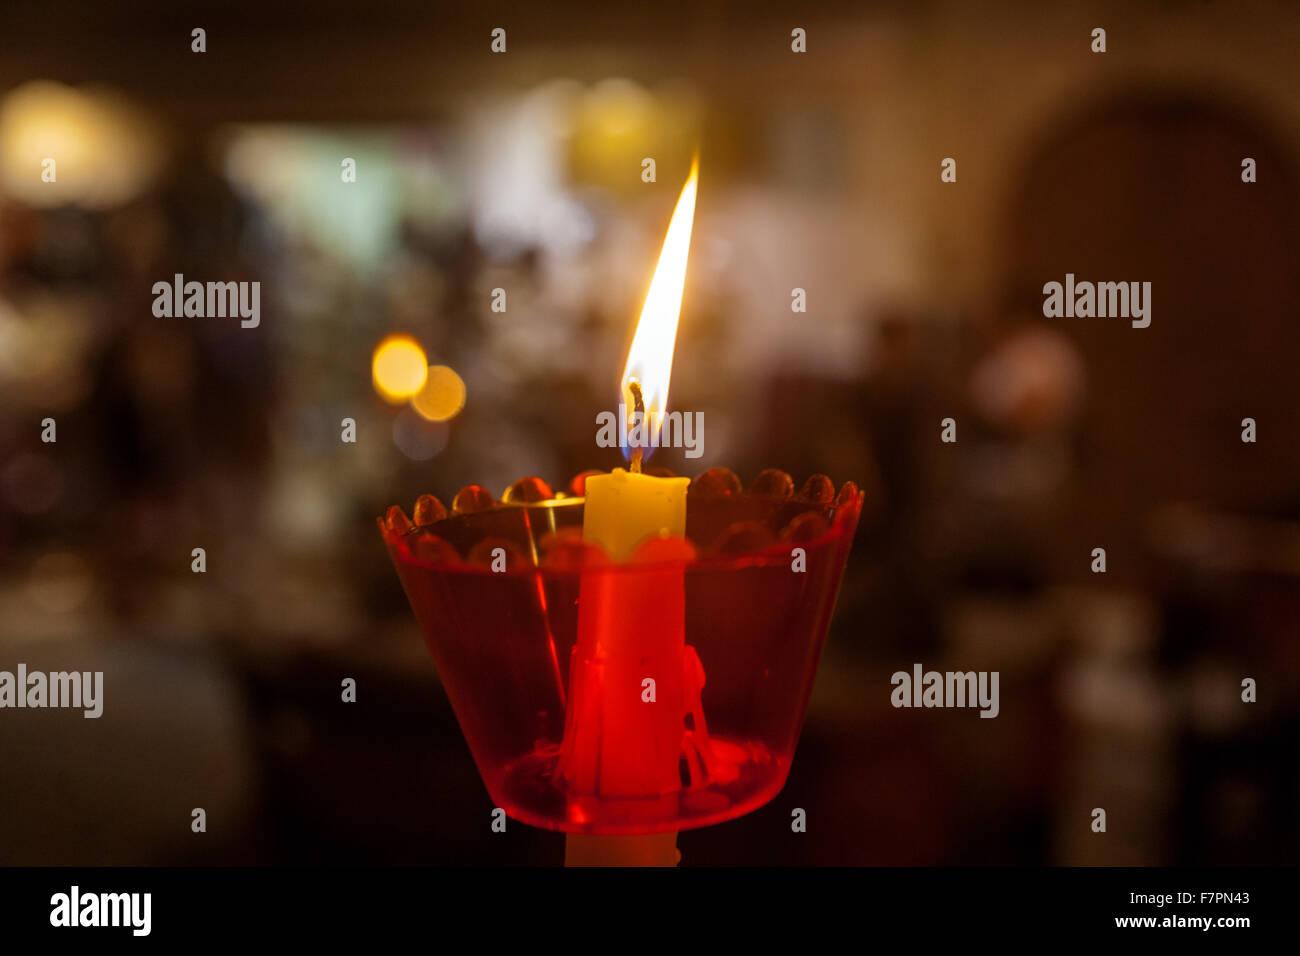 Closeup of a burning candle - Stock Image